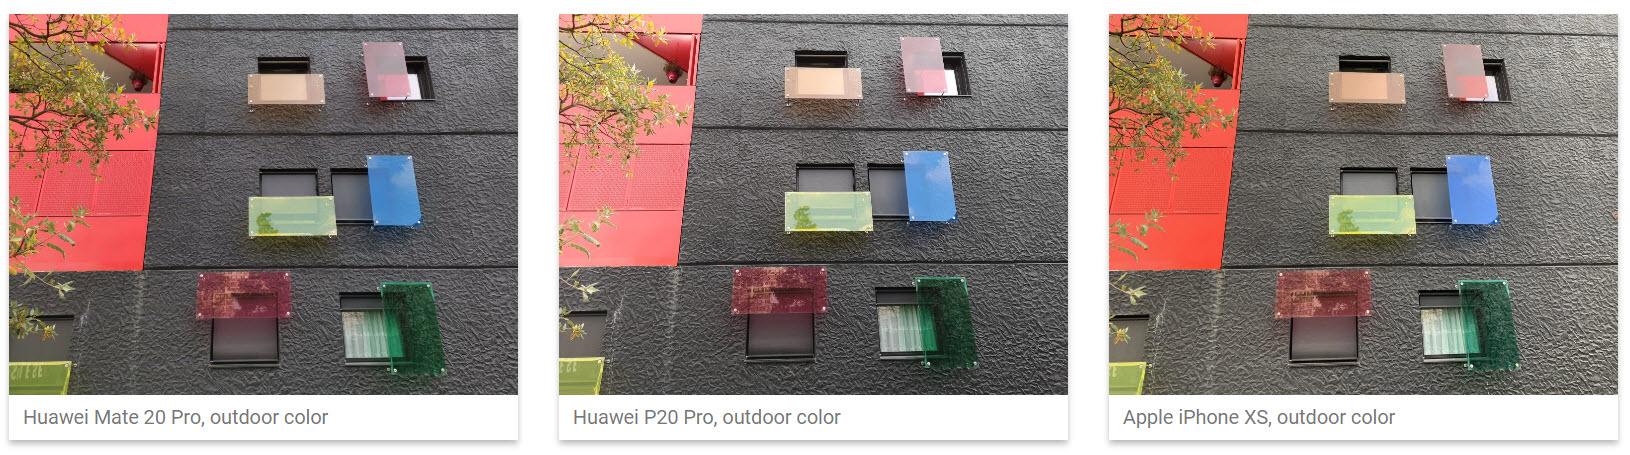 Dxomark Huawei Mate 20 Pro Camera Img 4